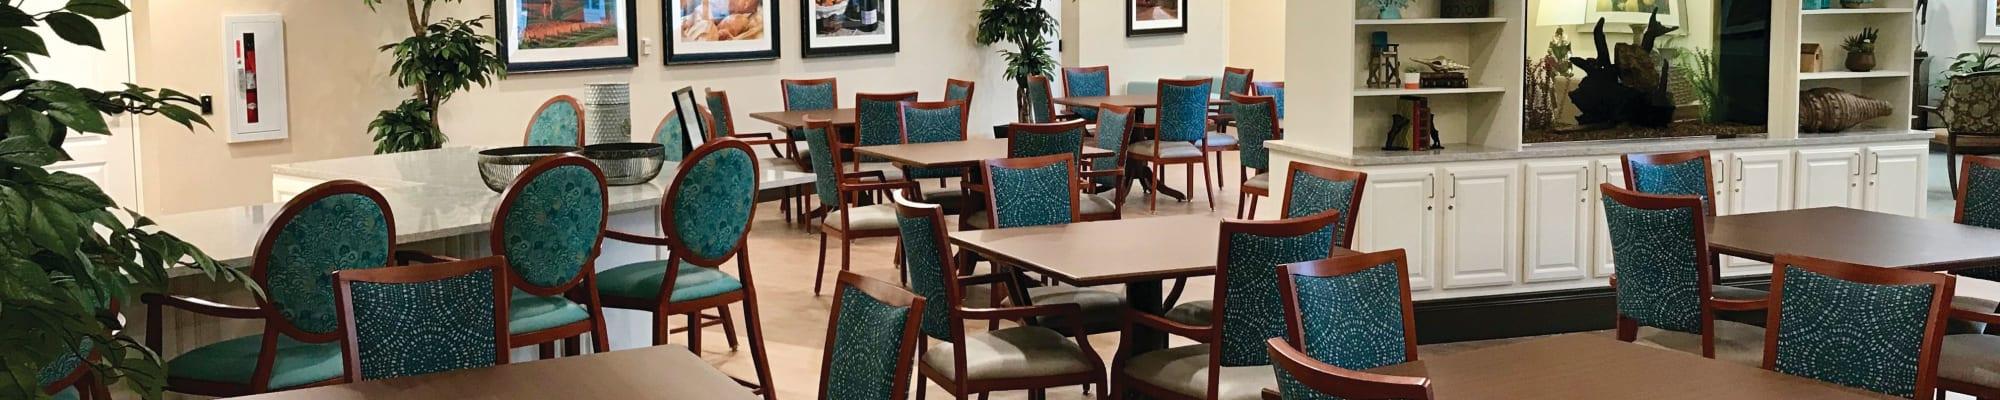 Dining at CERTUS Premier Memory Care Living in Mount Dora, Florida.